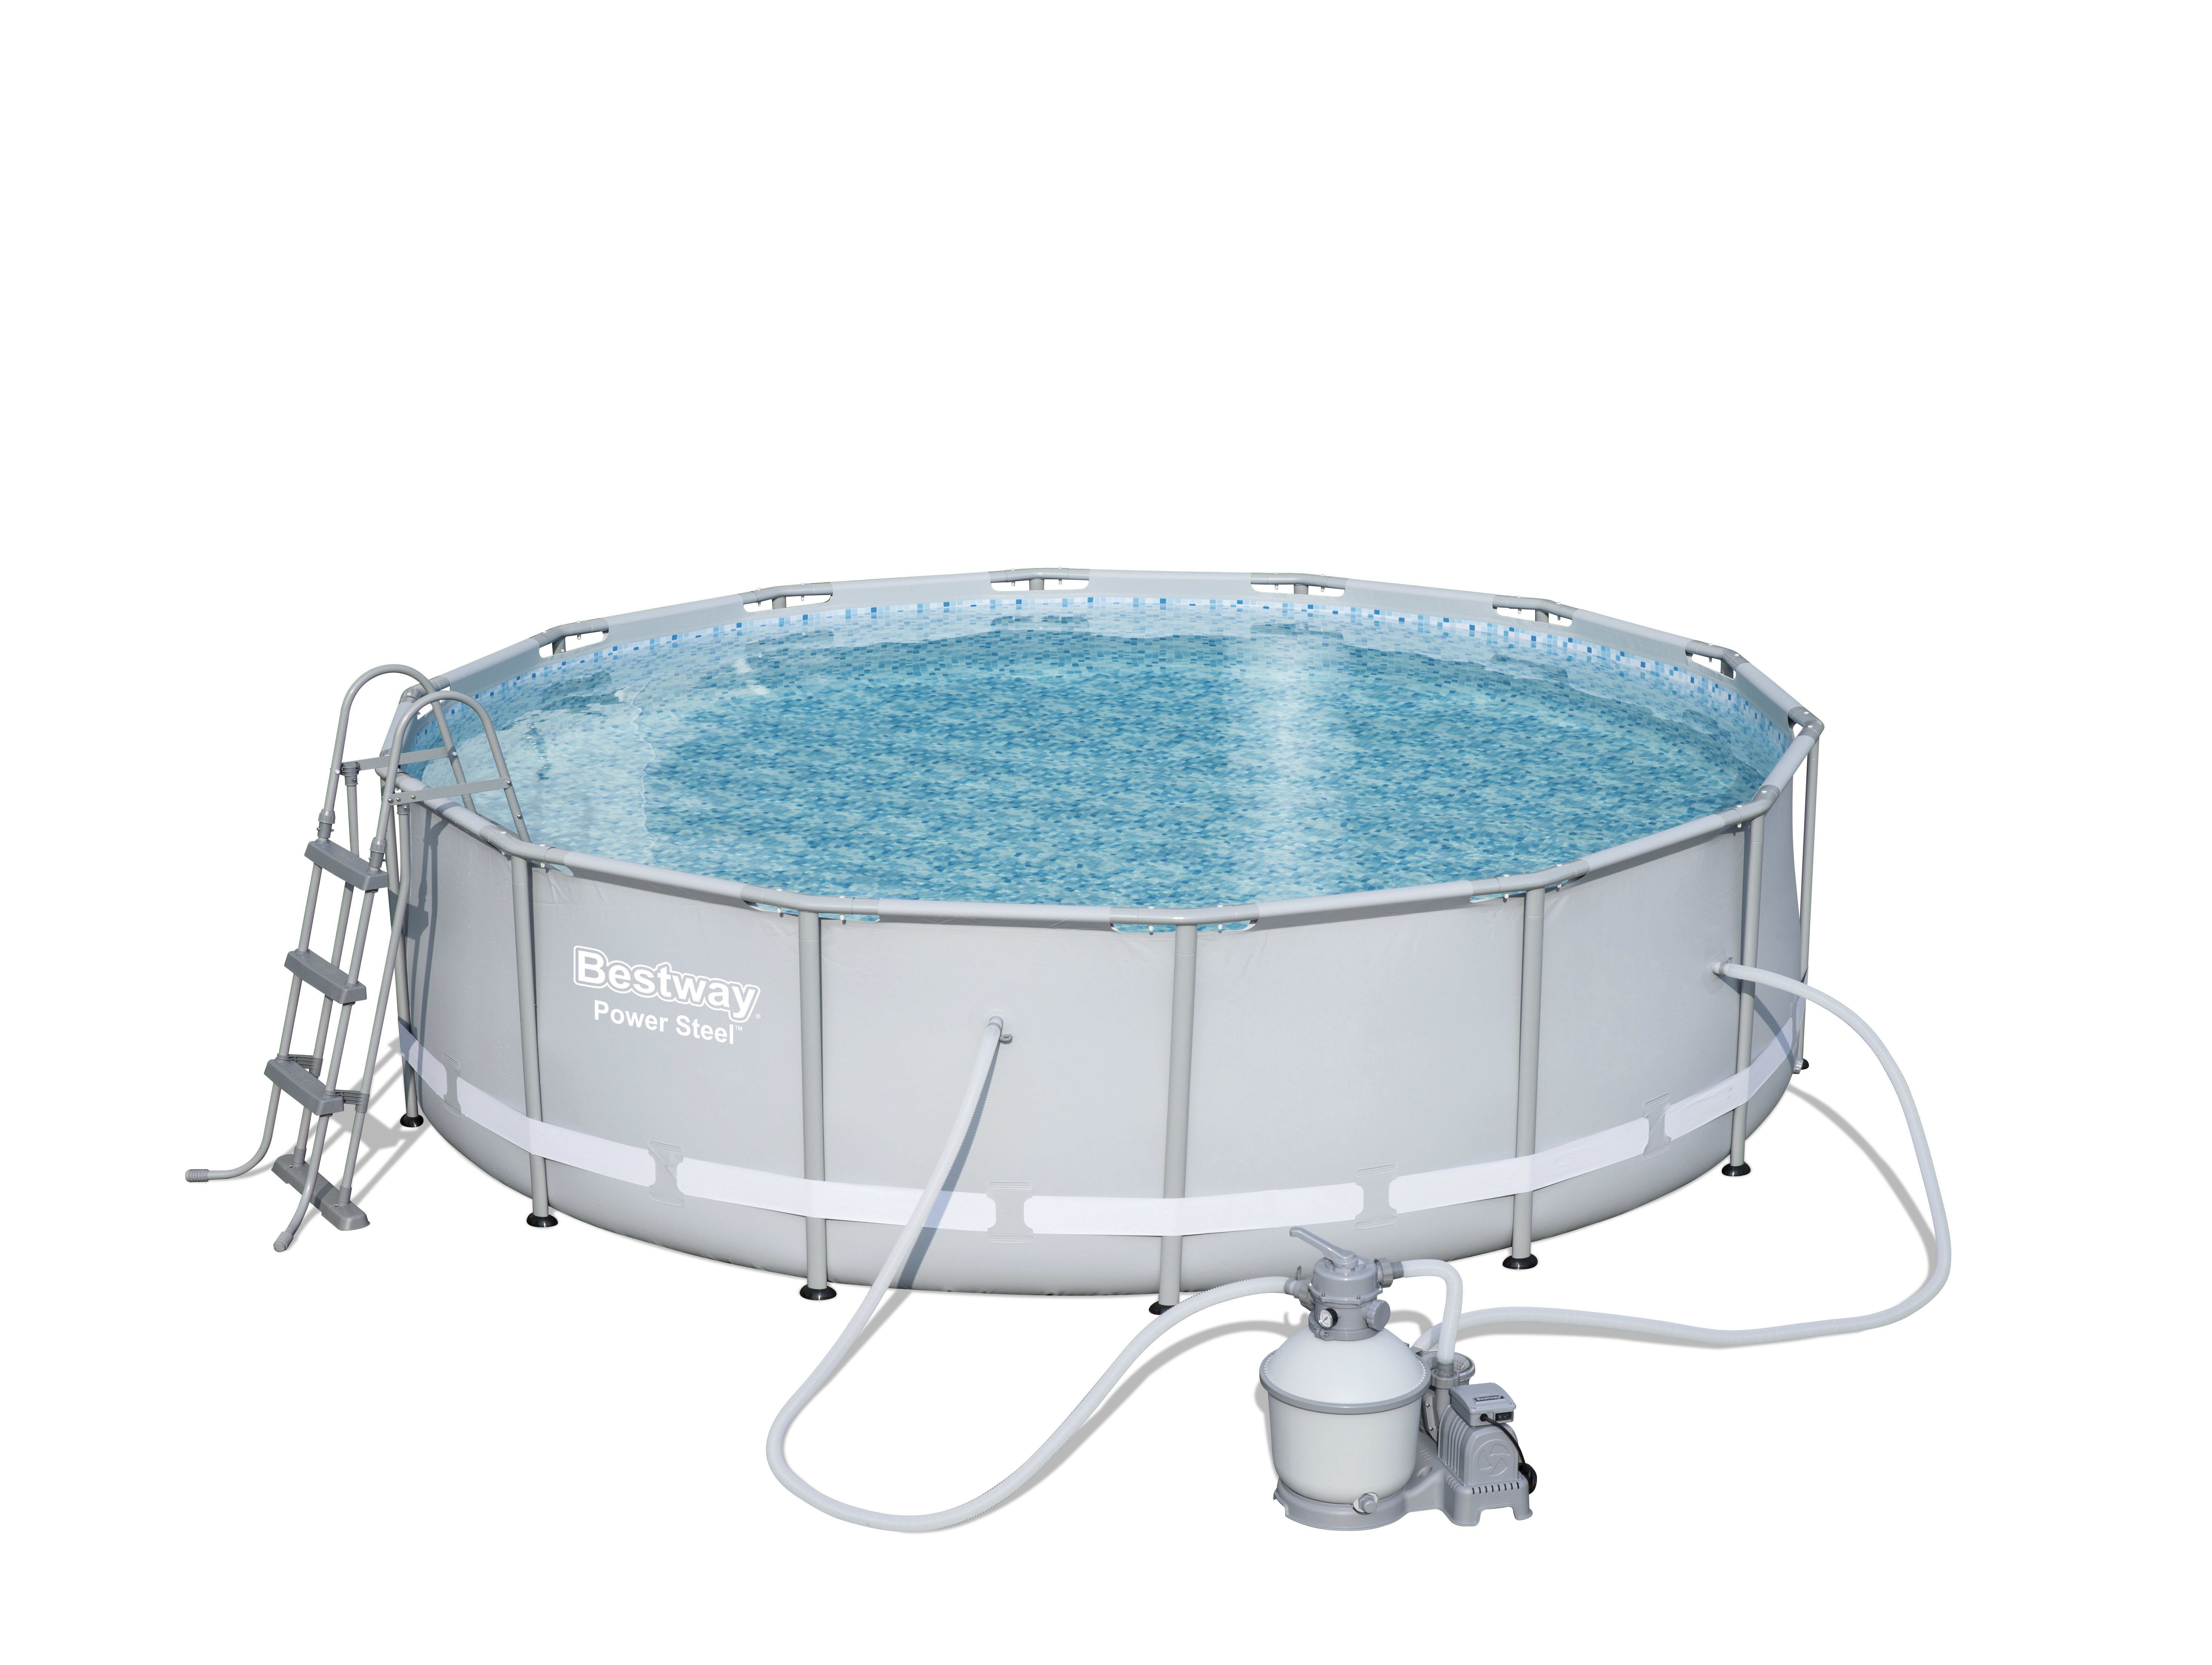 7 in 1 Pool Frame Pool Schwimmbecken Gartenpool 427 x 107 cm Pool BESTWAY